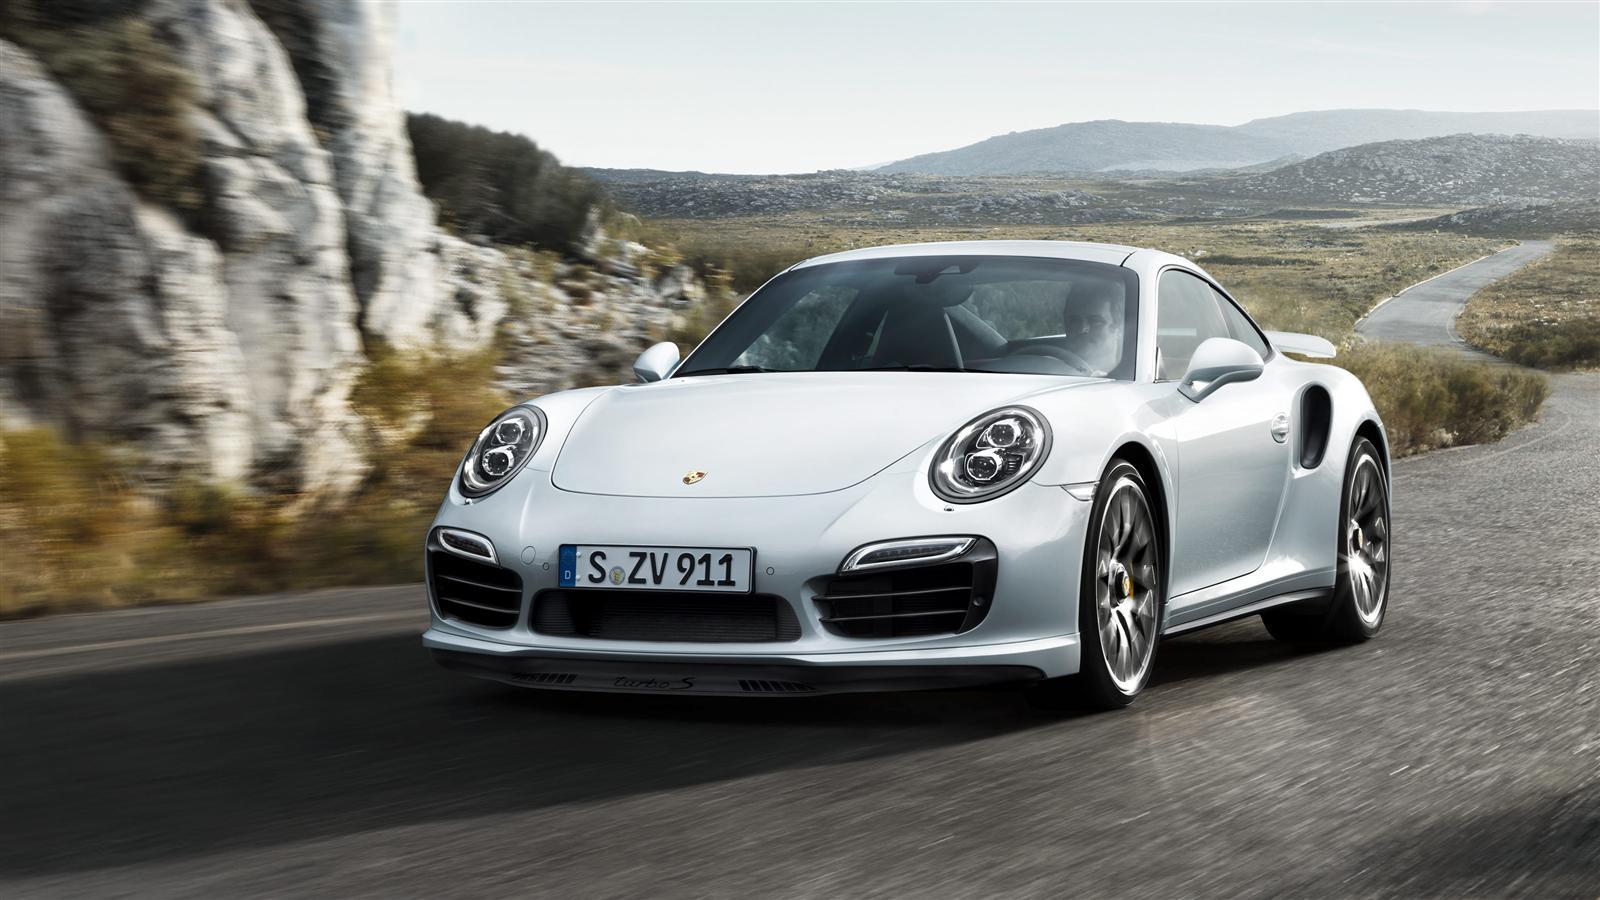 The Porsche 911 Turbo S